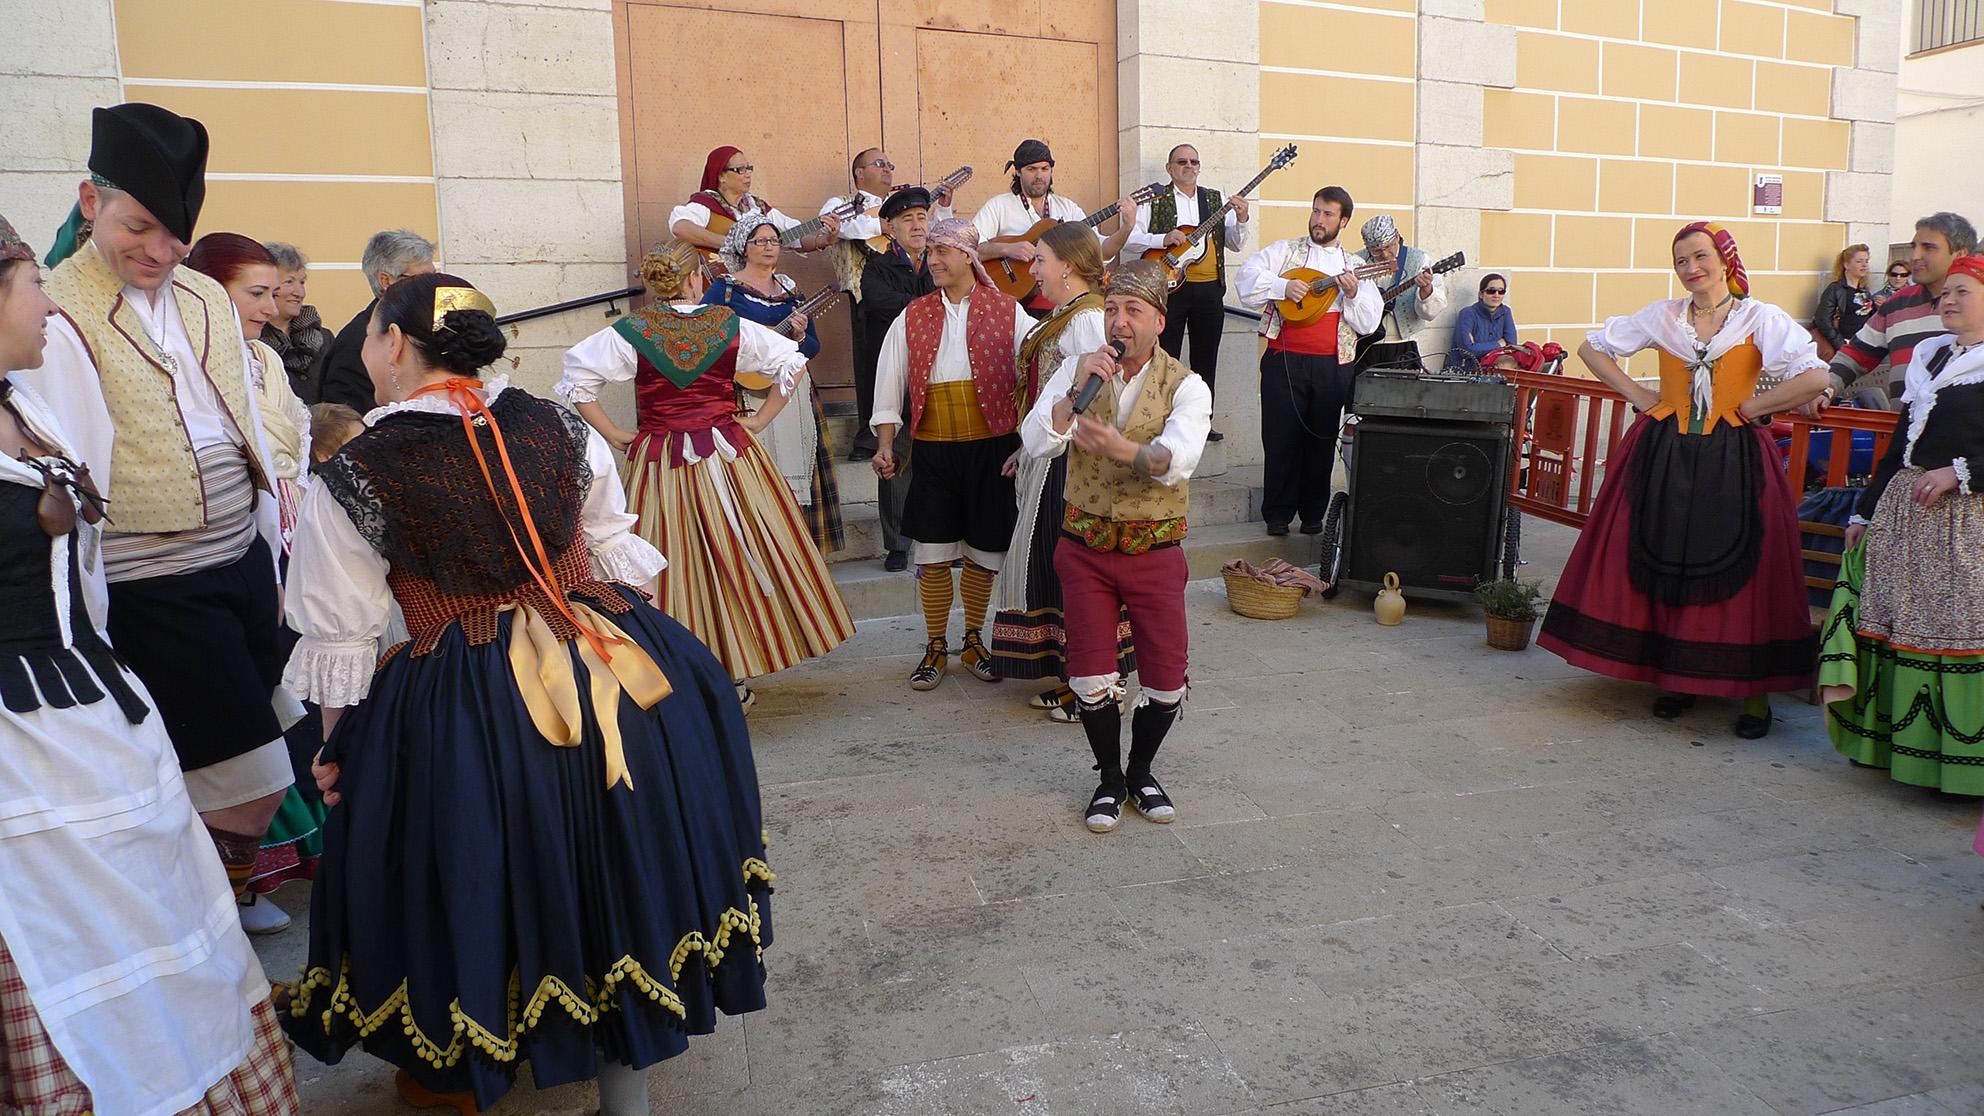 2014-02-23 - Baladre a Fira St. Marcia-ROTOVA (51)